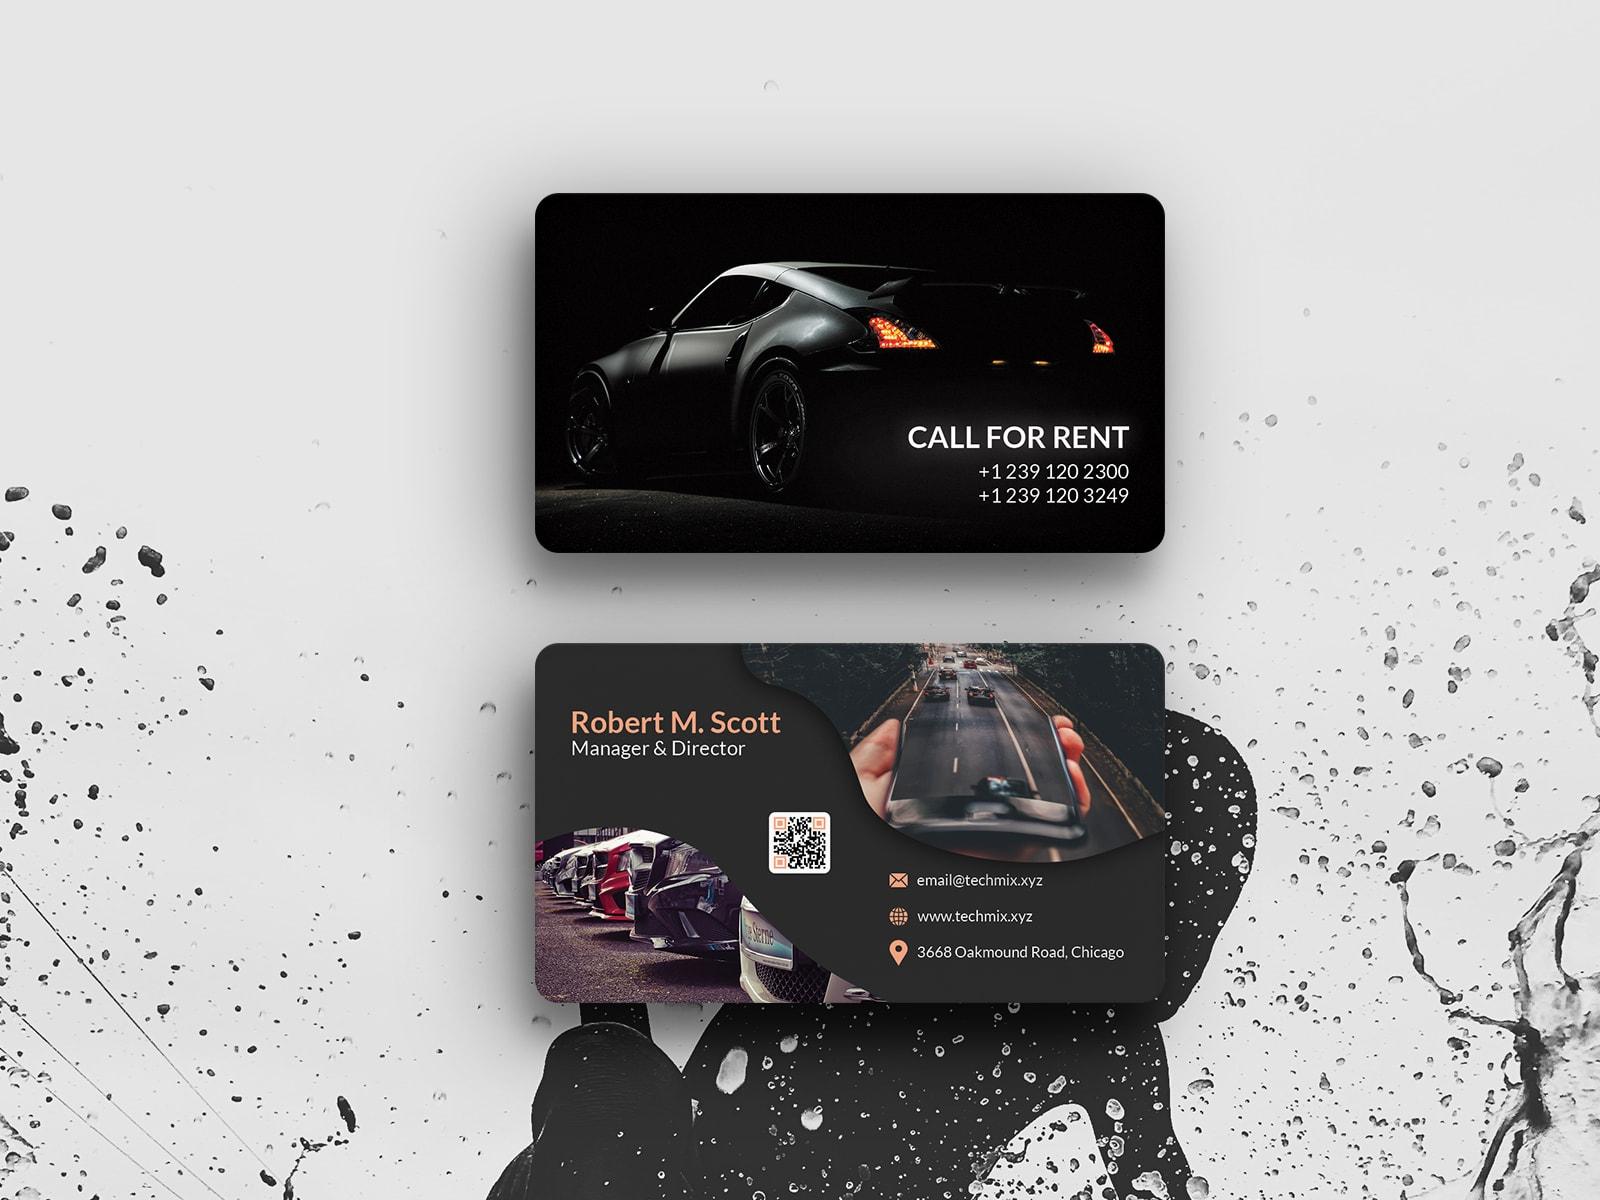 Rent a Car Business Card Design